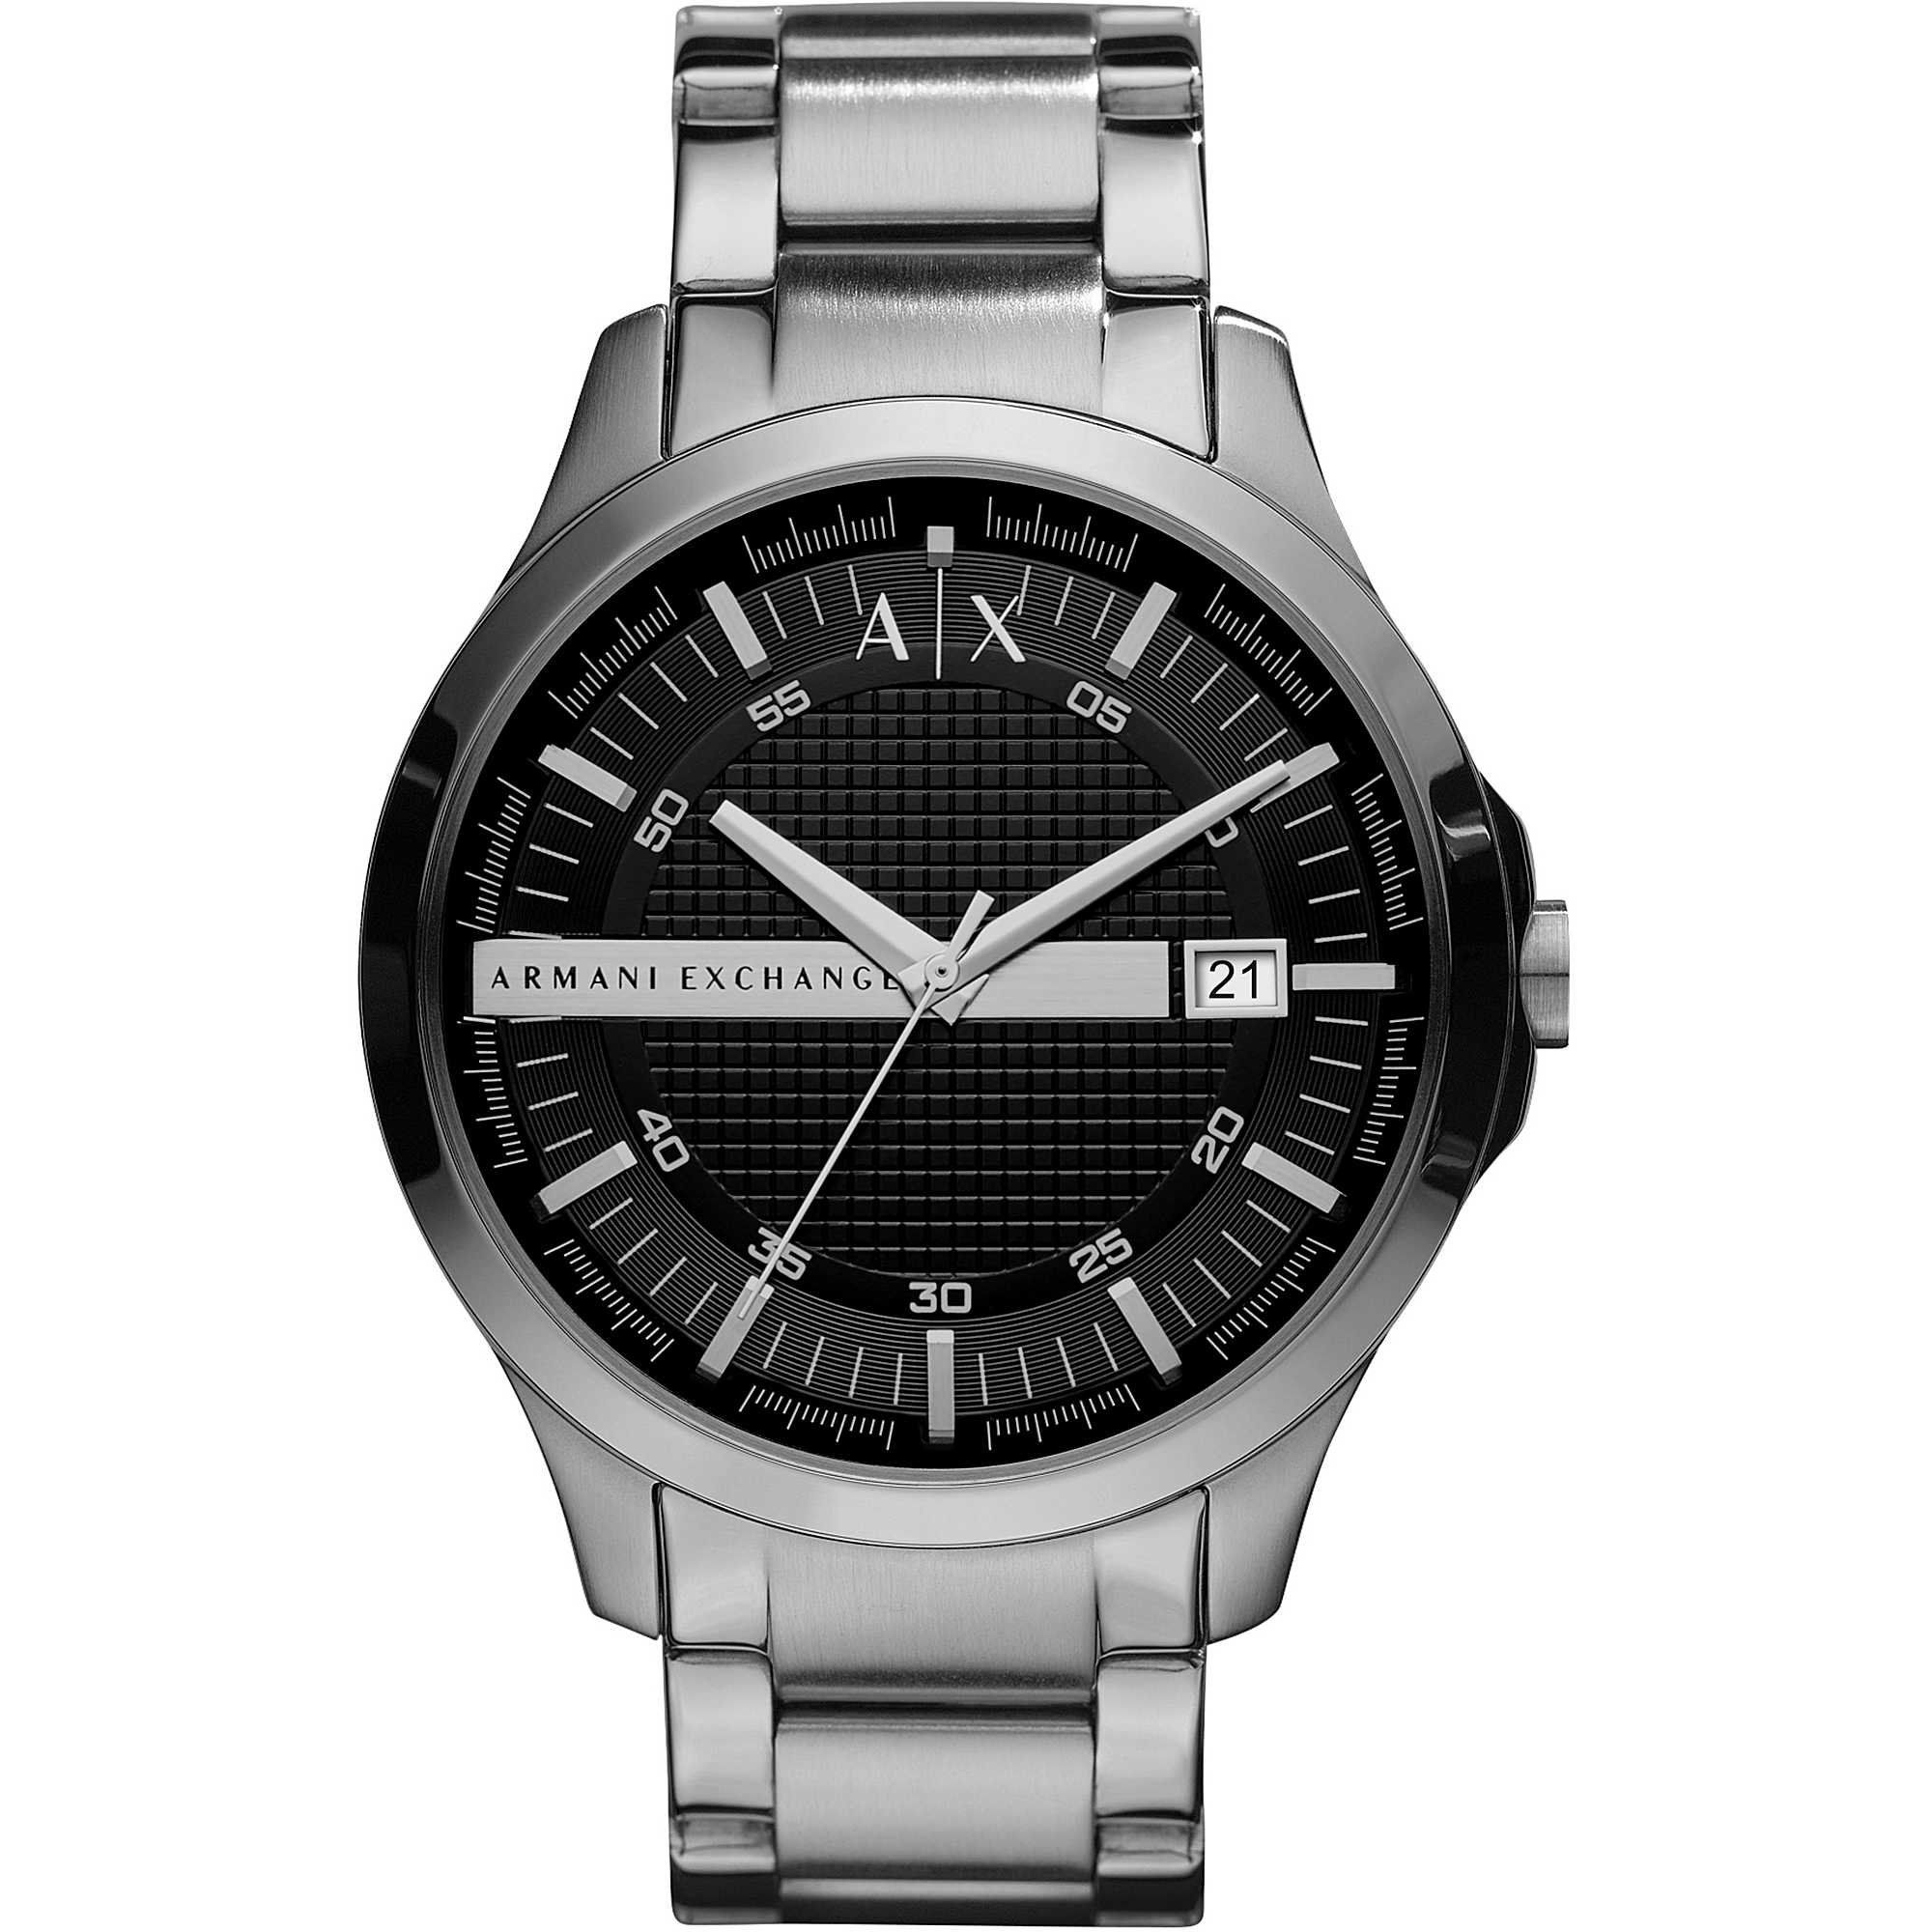 ARMANI EXCHANGE-Orologio da uomo